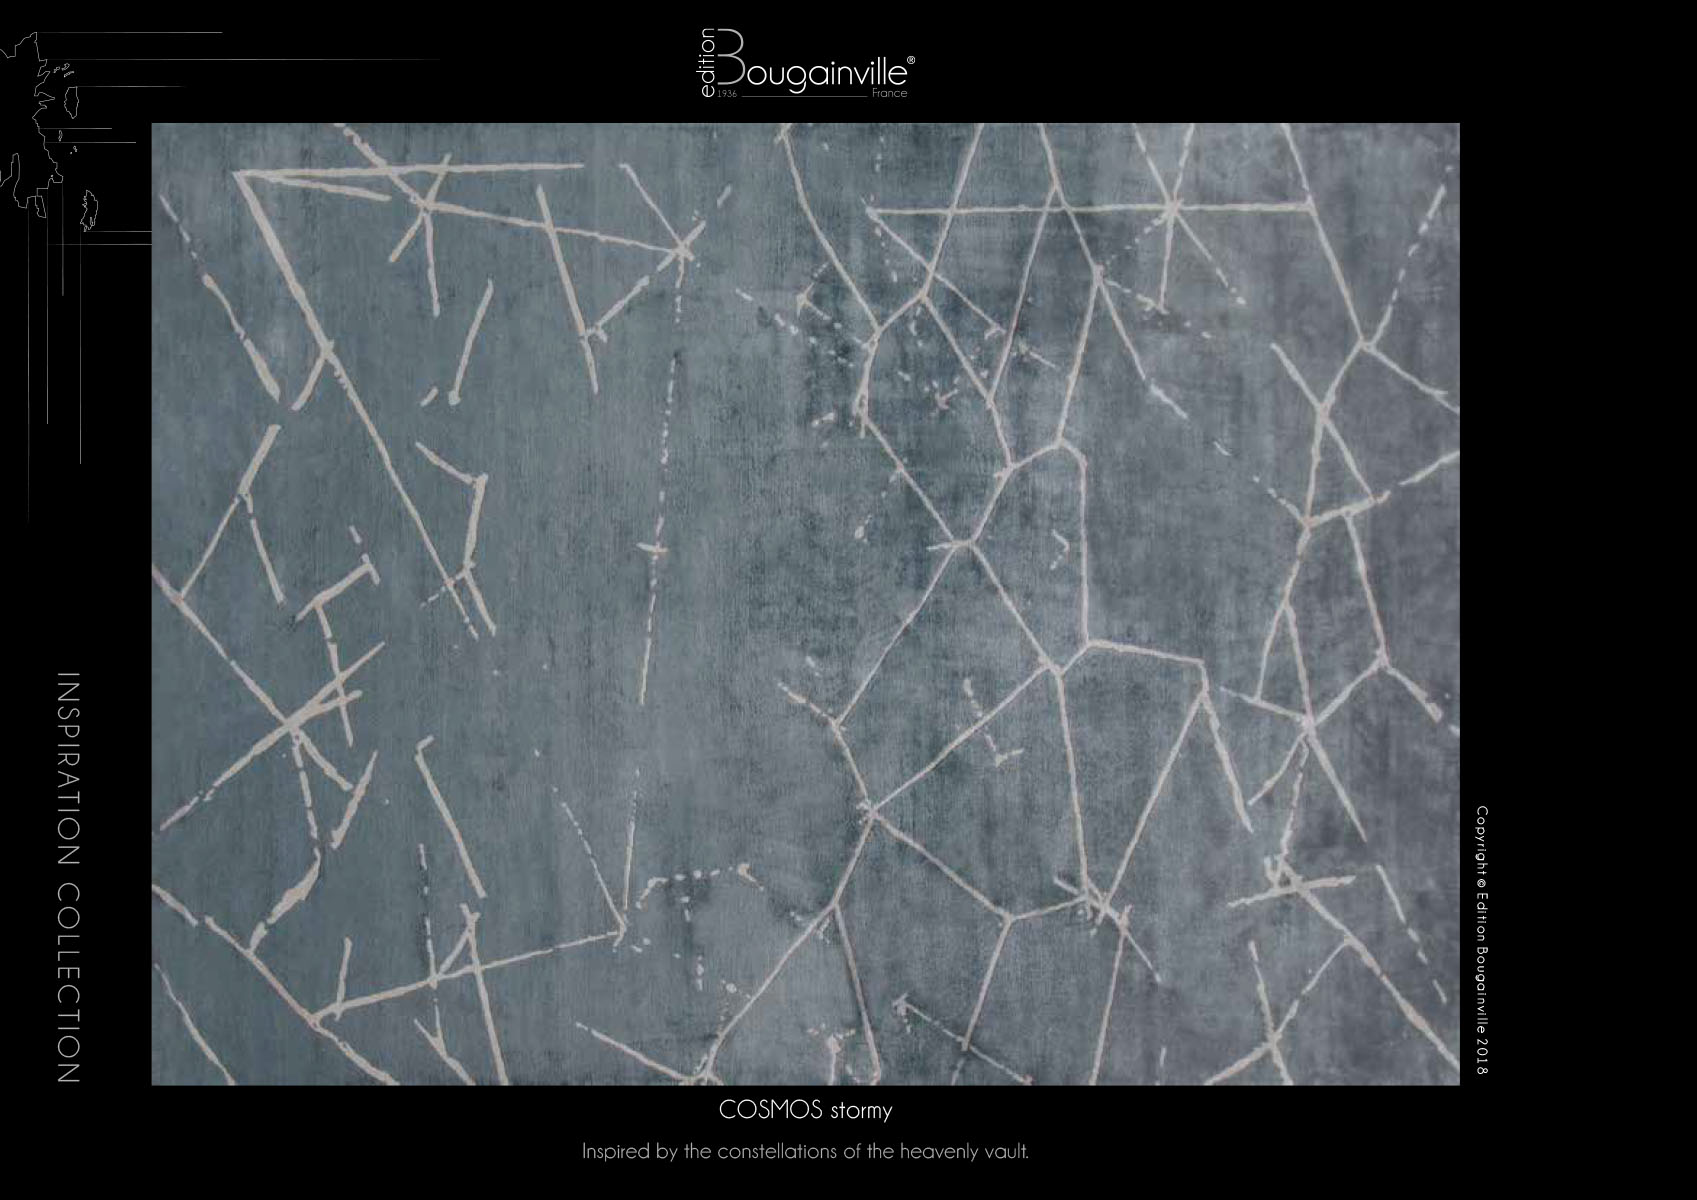 Ковер Edition Bougainville, COSMOS stormy